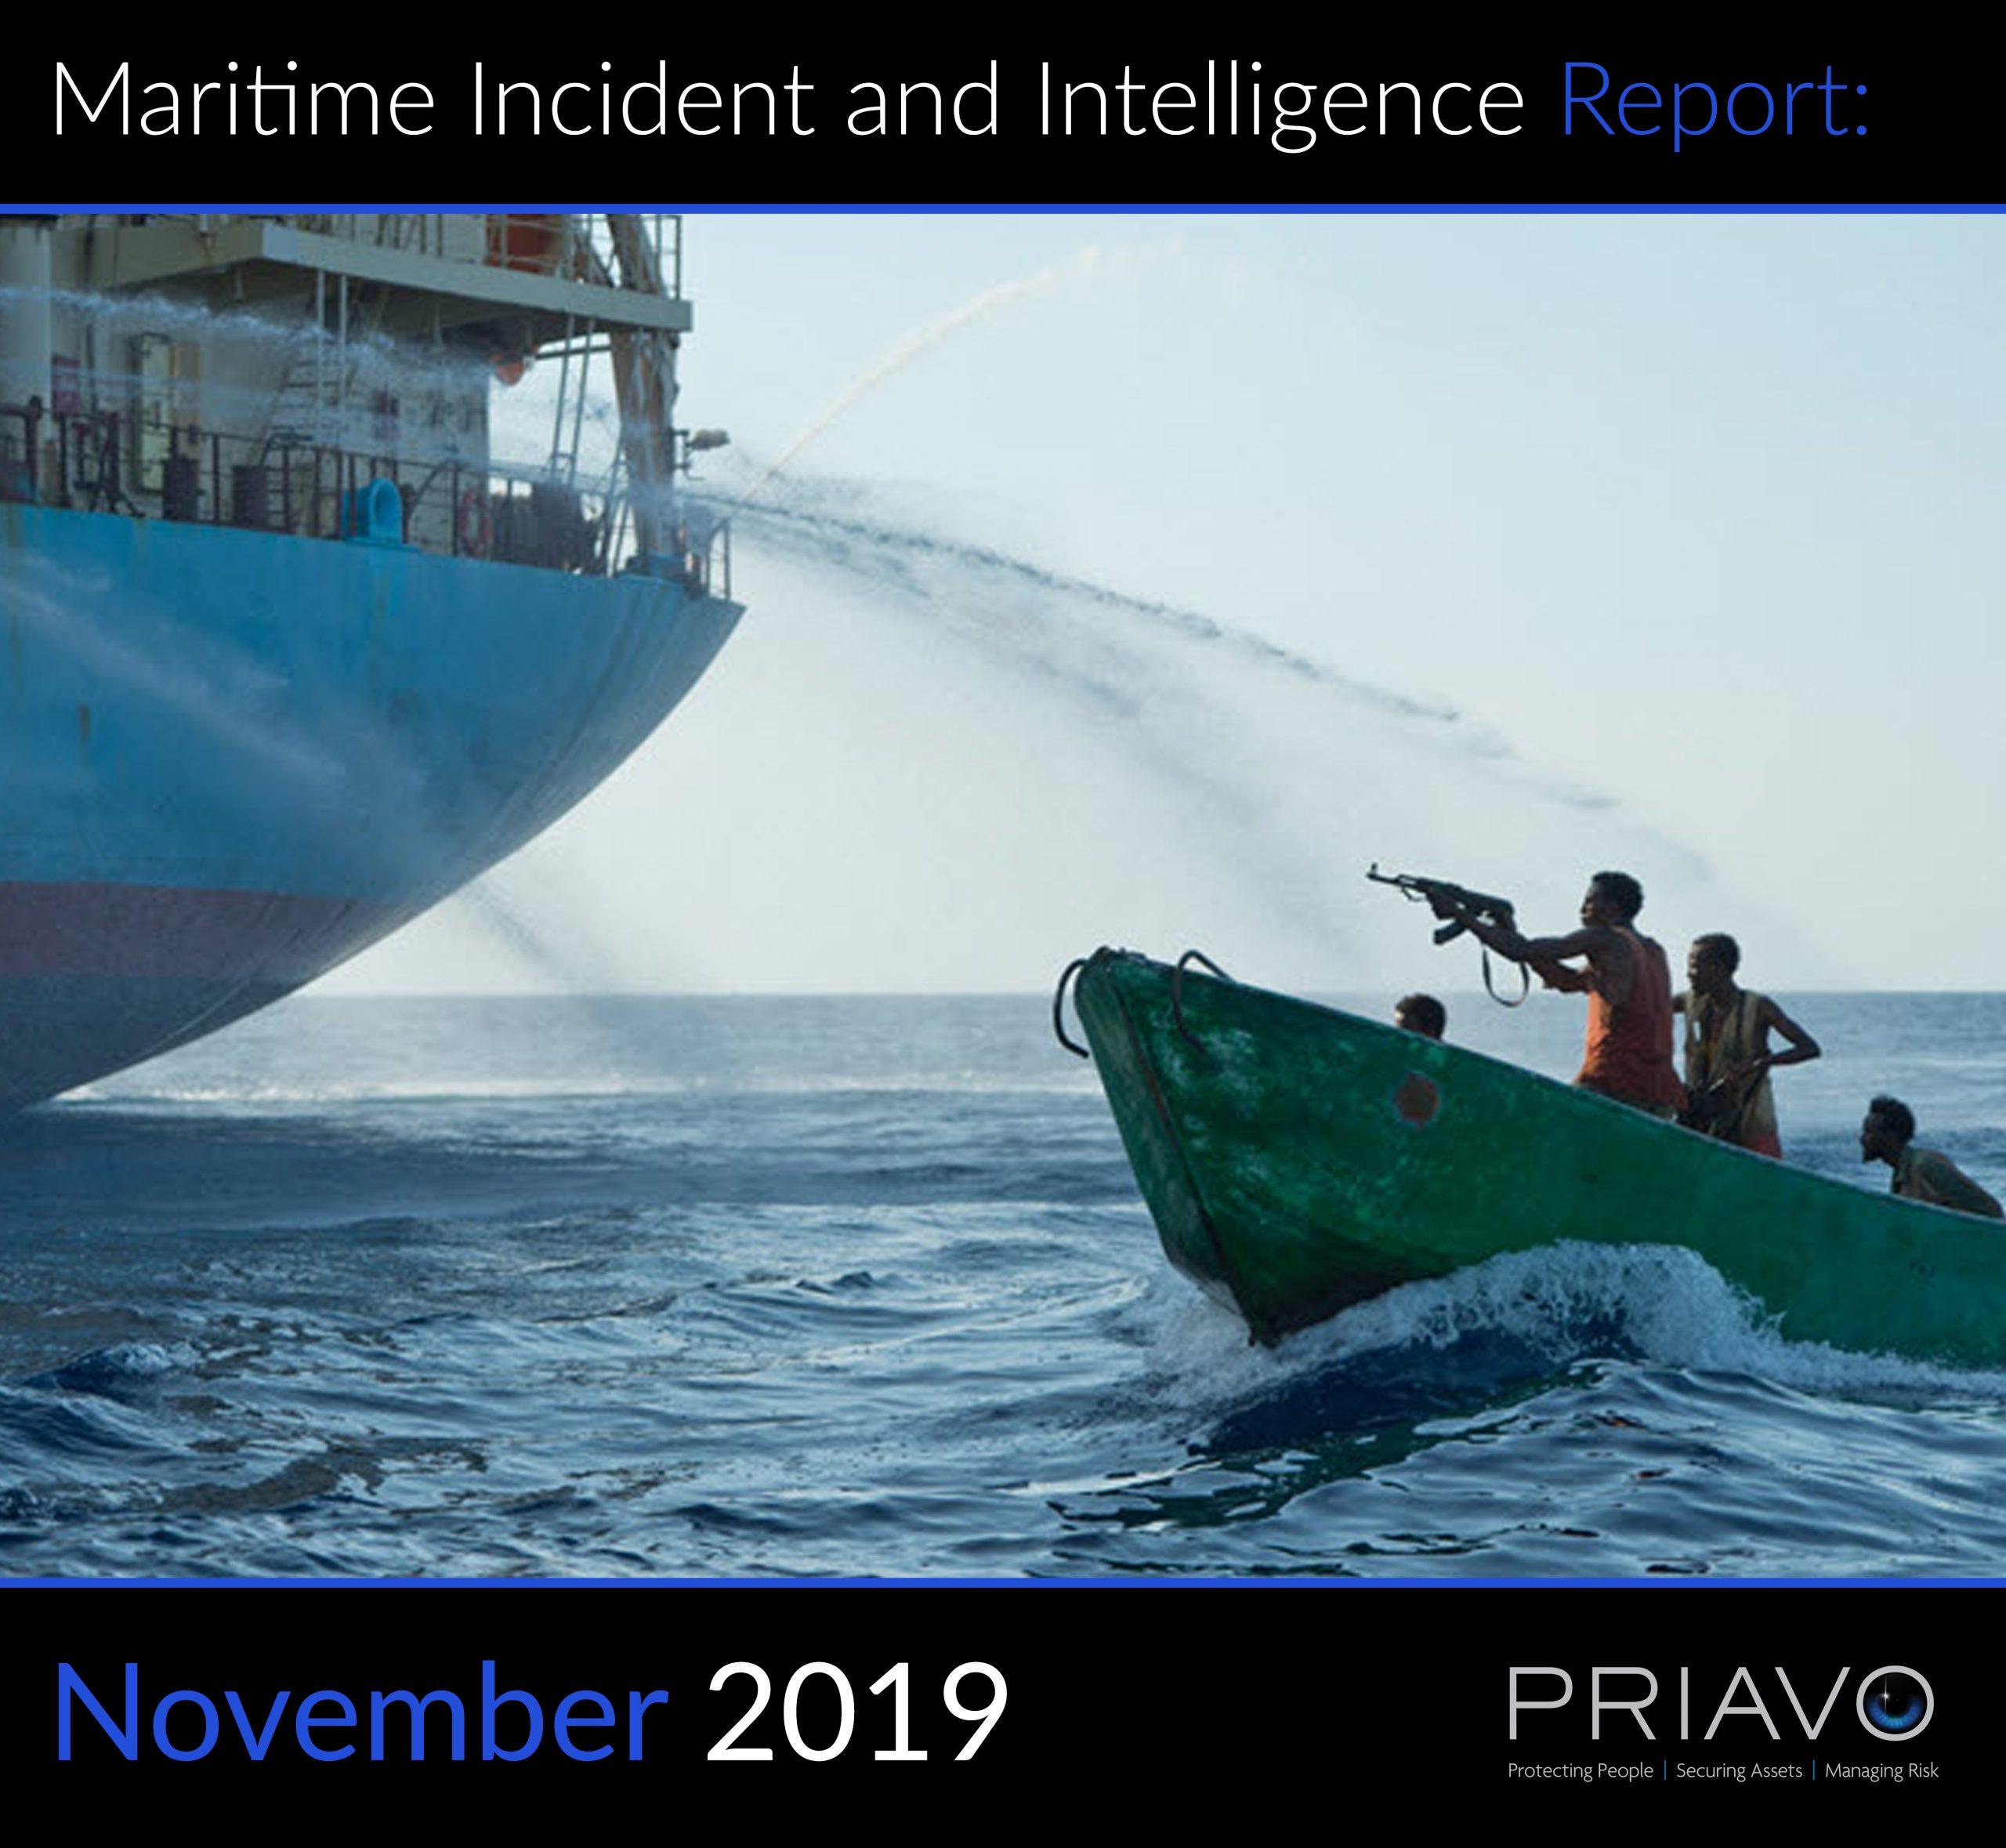 Maritime Incident Report: November 2019